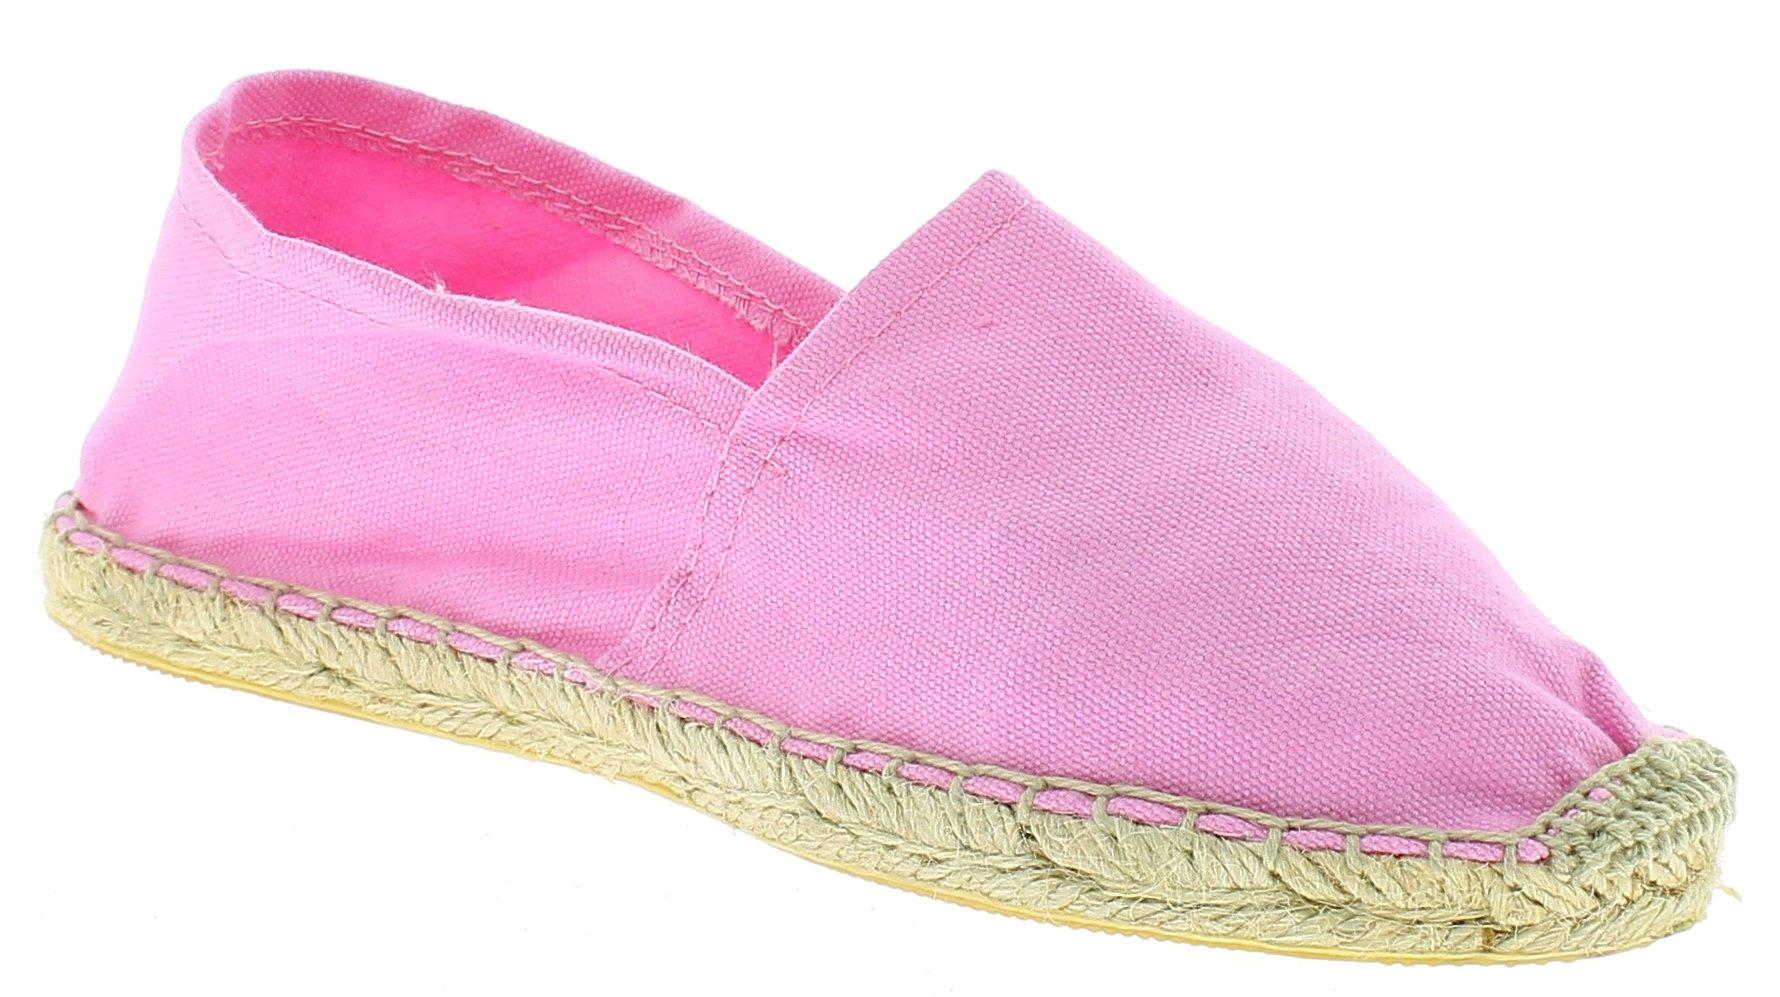 MADIGAN Γυναικεία Casual ESPAGNA Ροζ - IqShoes - ESPAGNA PINK-pink-35/1/11/29 προϊόντα παπούτσια